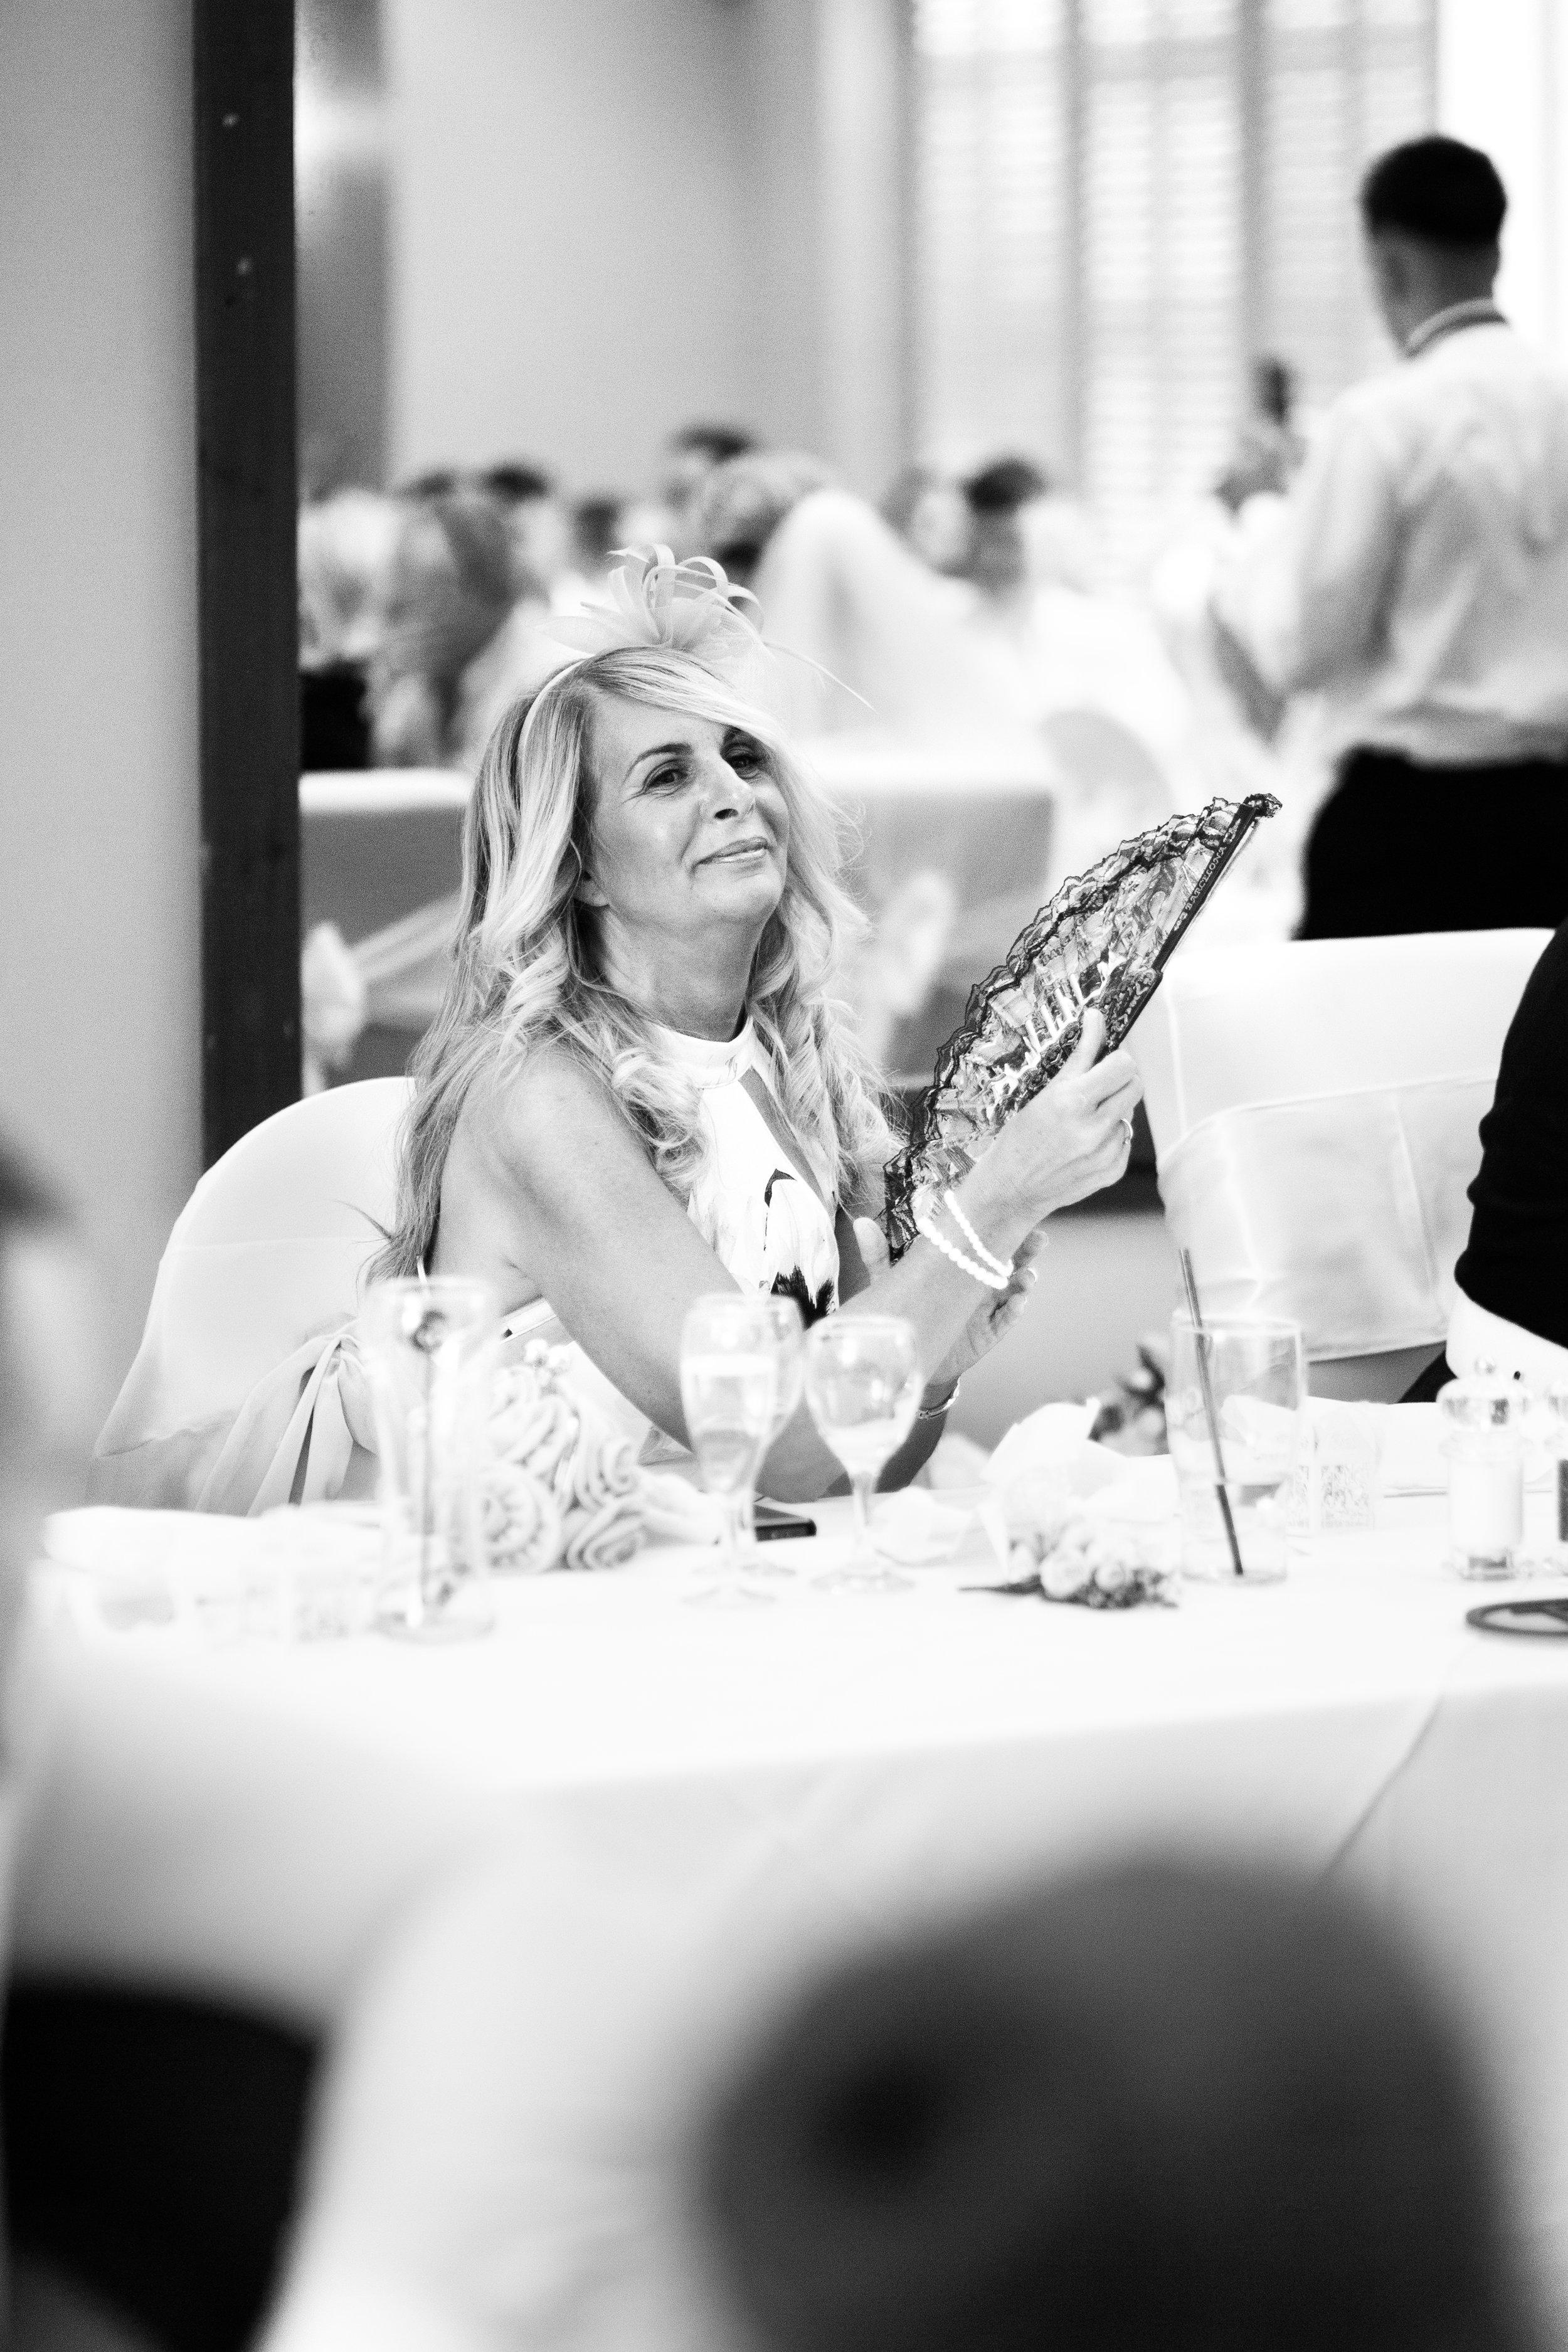 wedding-lea-cooper-photography-willenhall-west-midlands-wolverhampton-dudley-birmingham-uk-marriage-hadley-park-east-telford-mother-of-the-bride.jpg